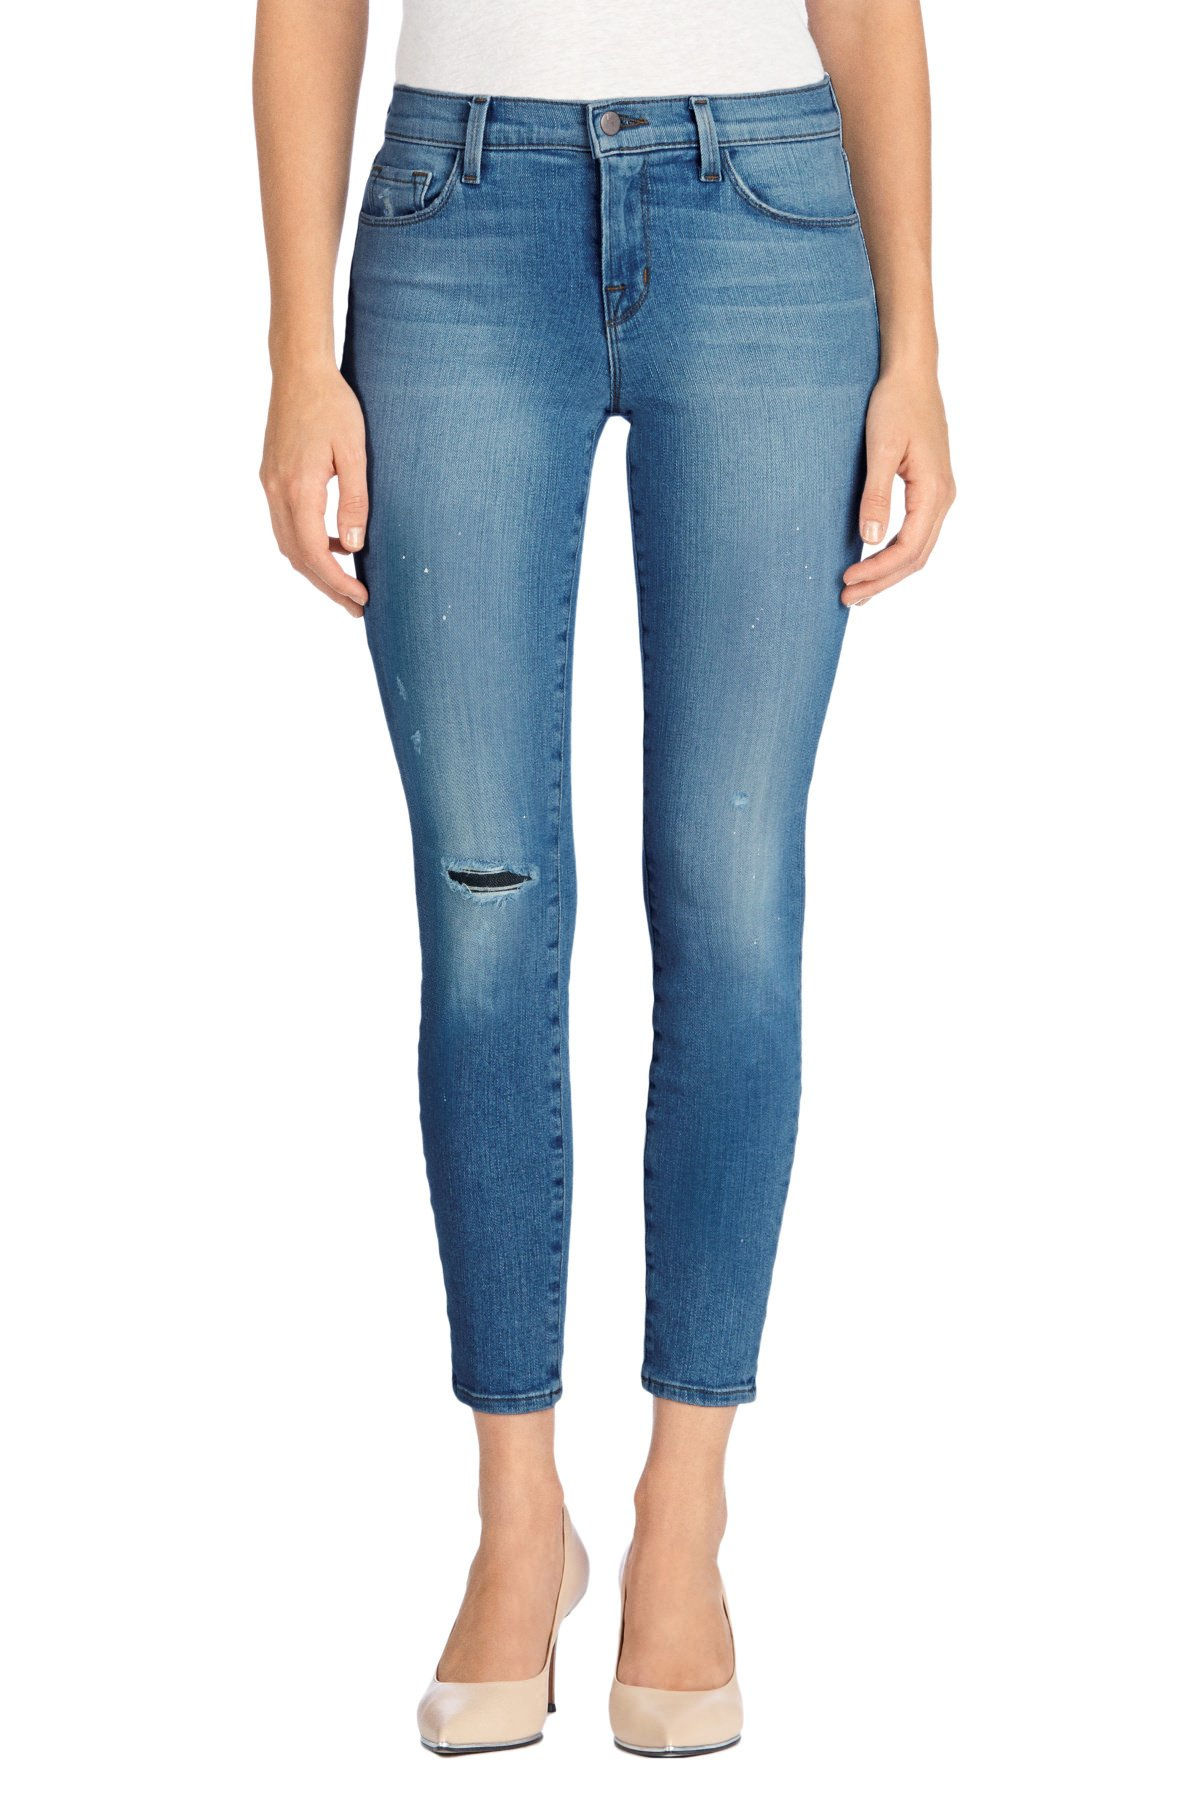 J Brand Womens Denim Distressed Capri Jeans Blue 25